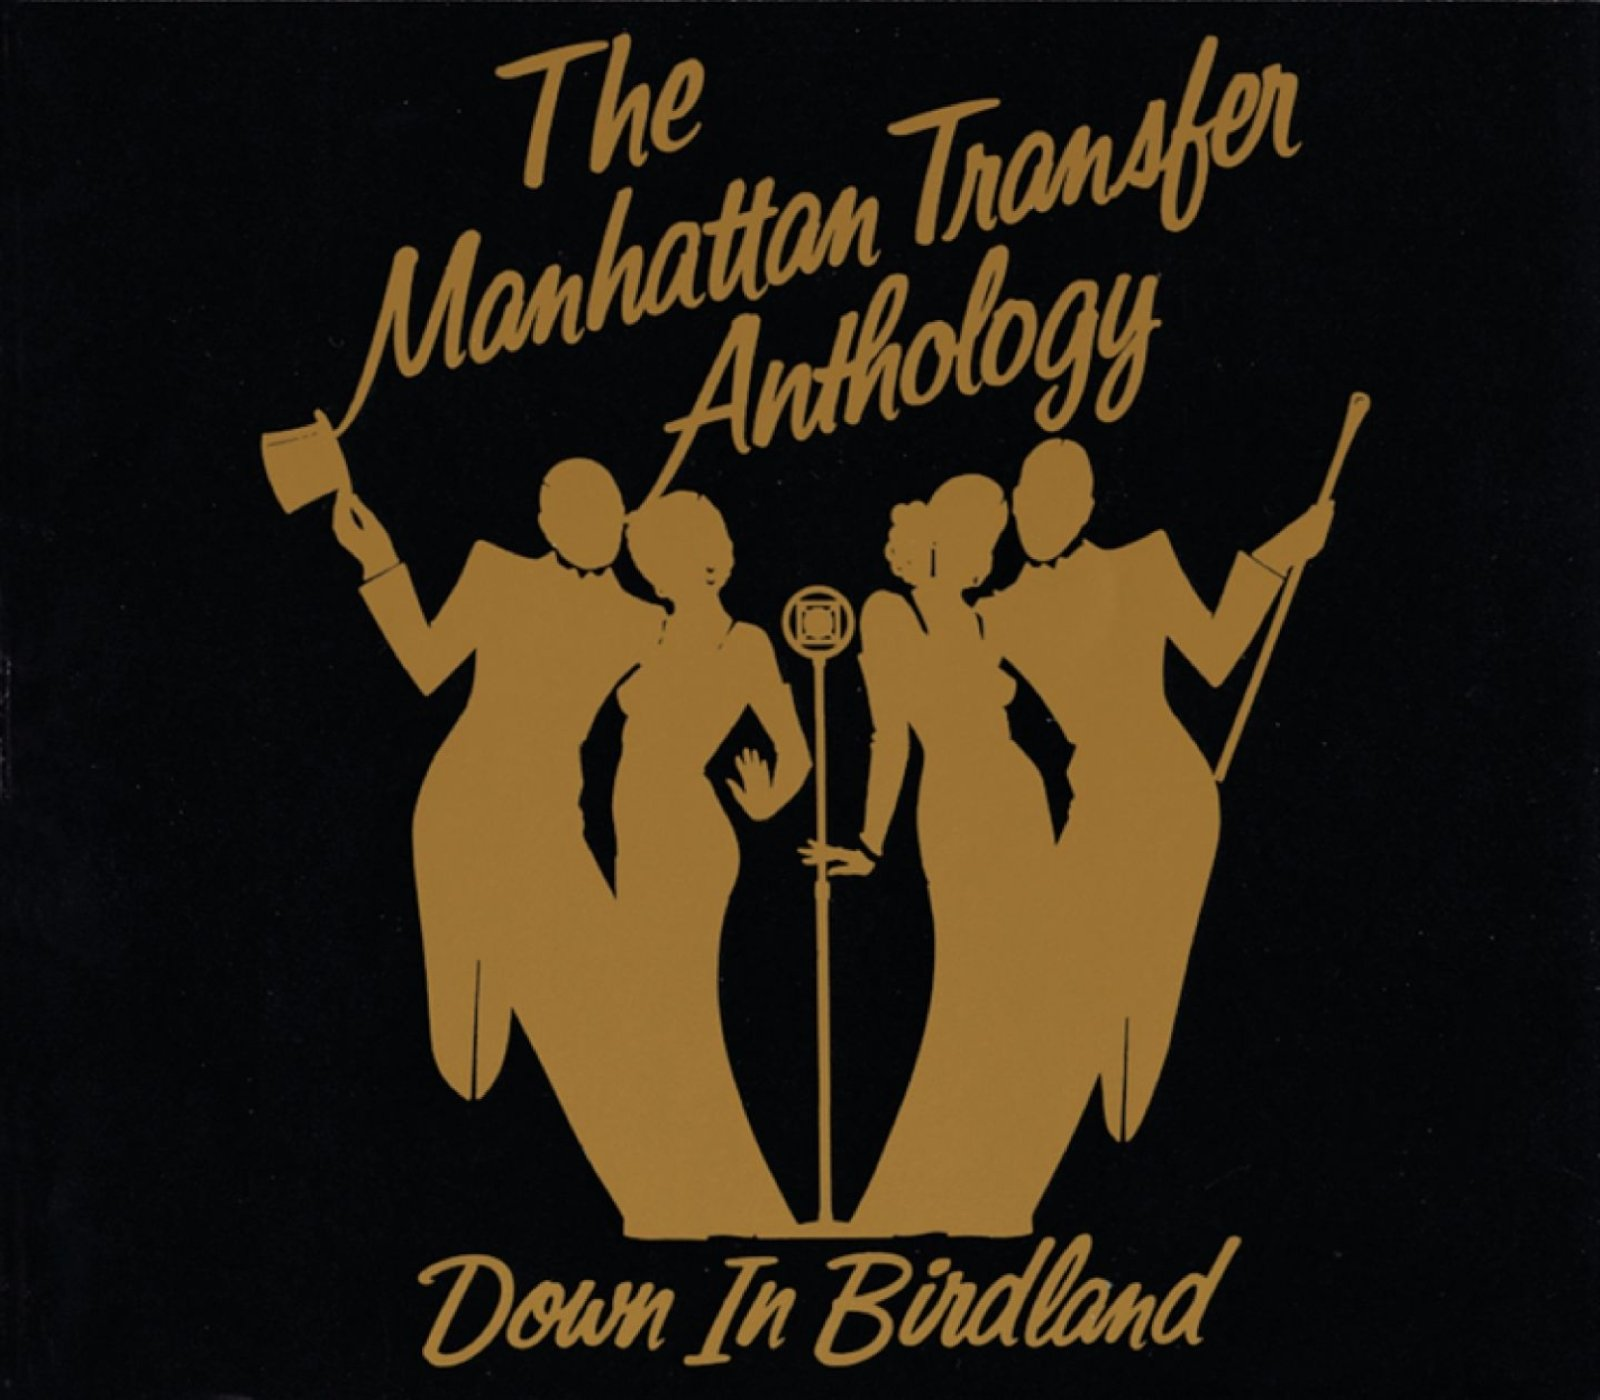 The Manhattan Transfer Anthology: Down In Birdland by MANHATTAN TRANSFER